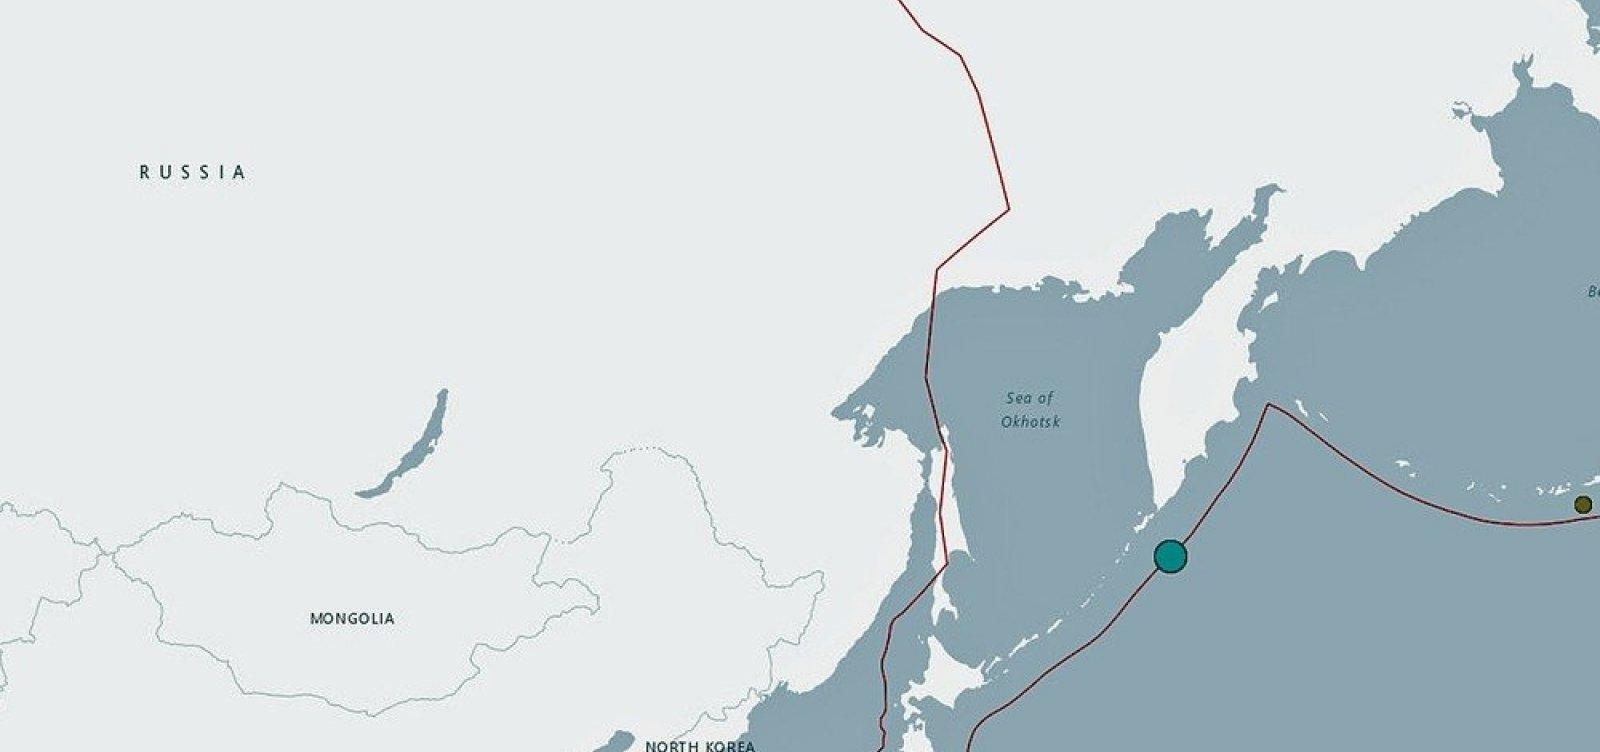 [Forte terremoto atinge mar das Ilhas Curilas, na Rússia]